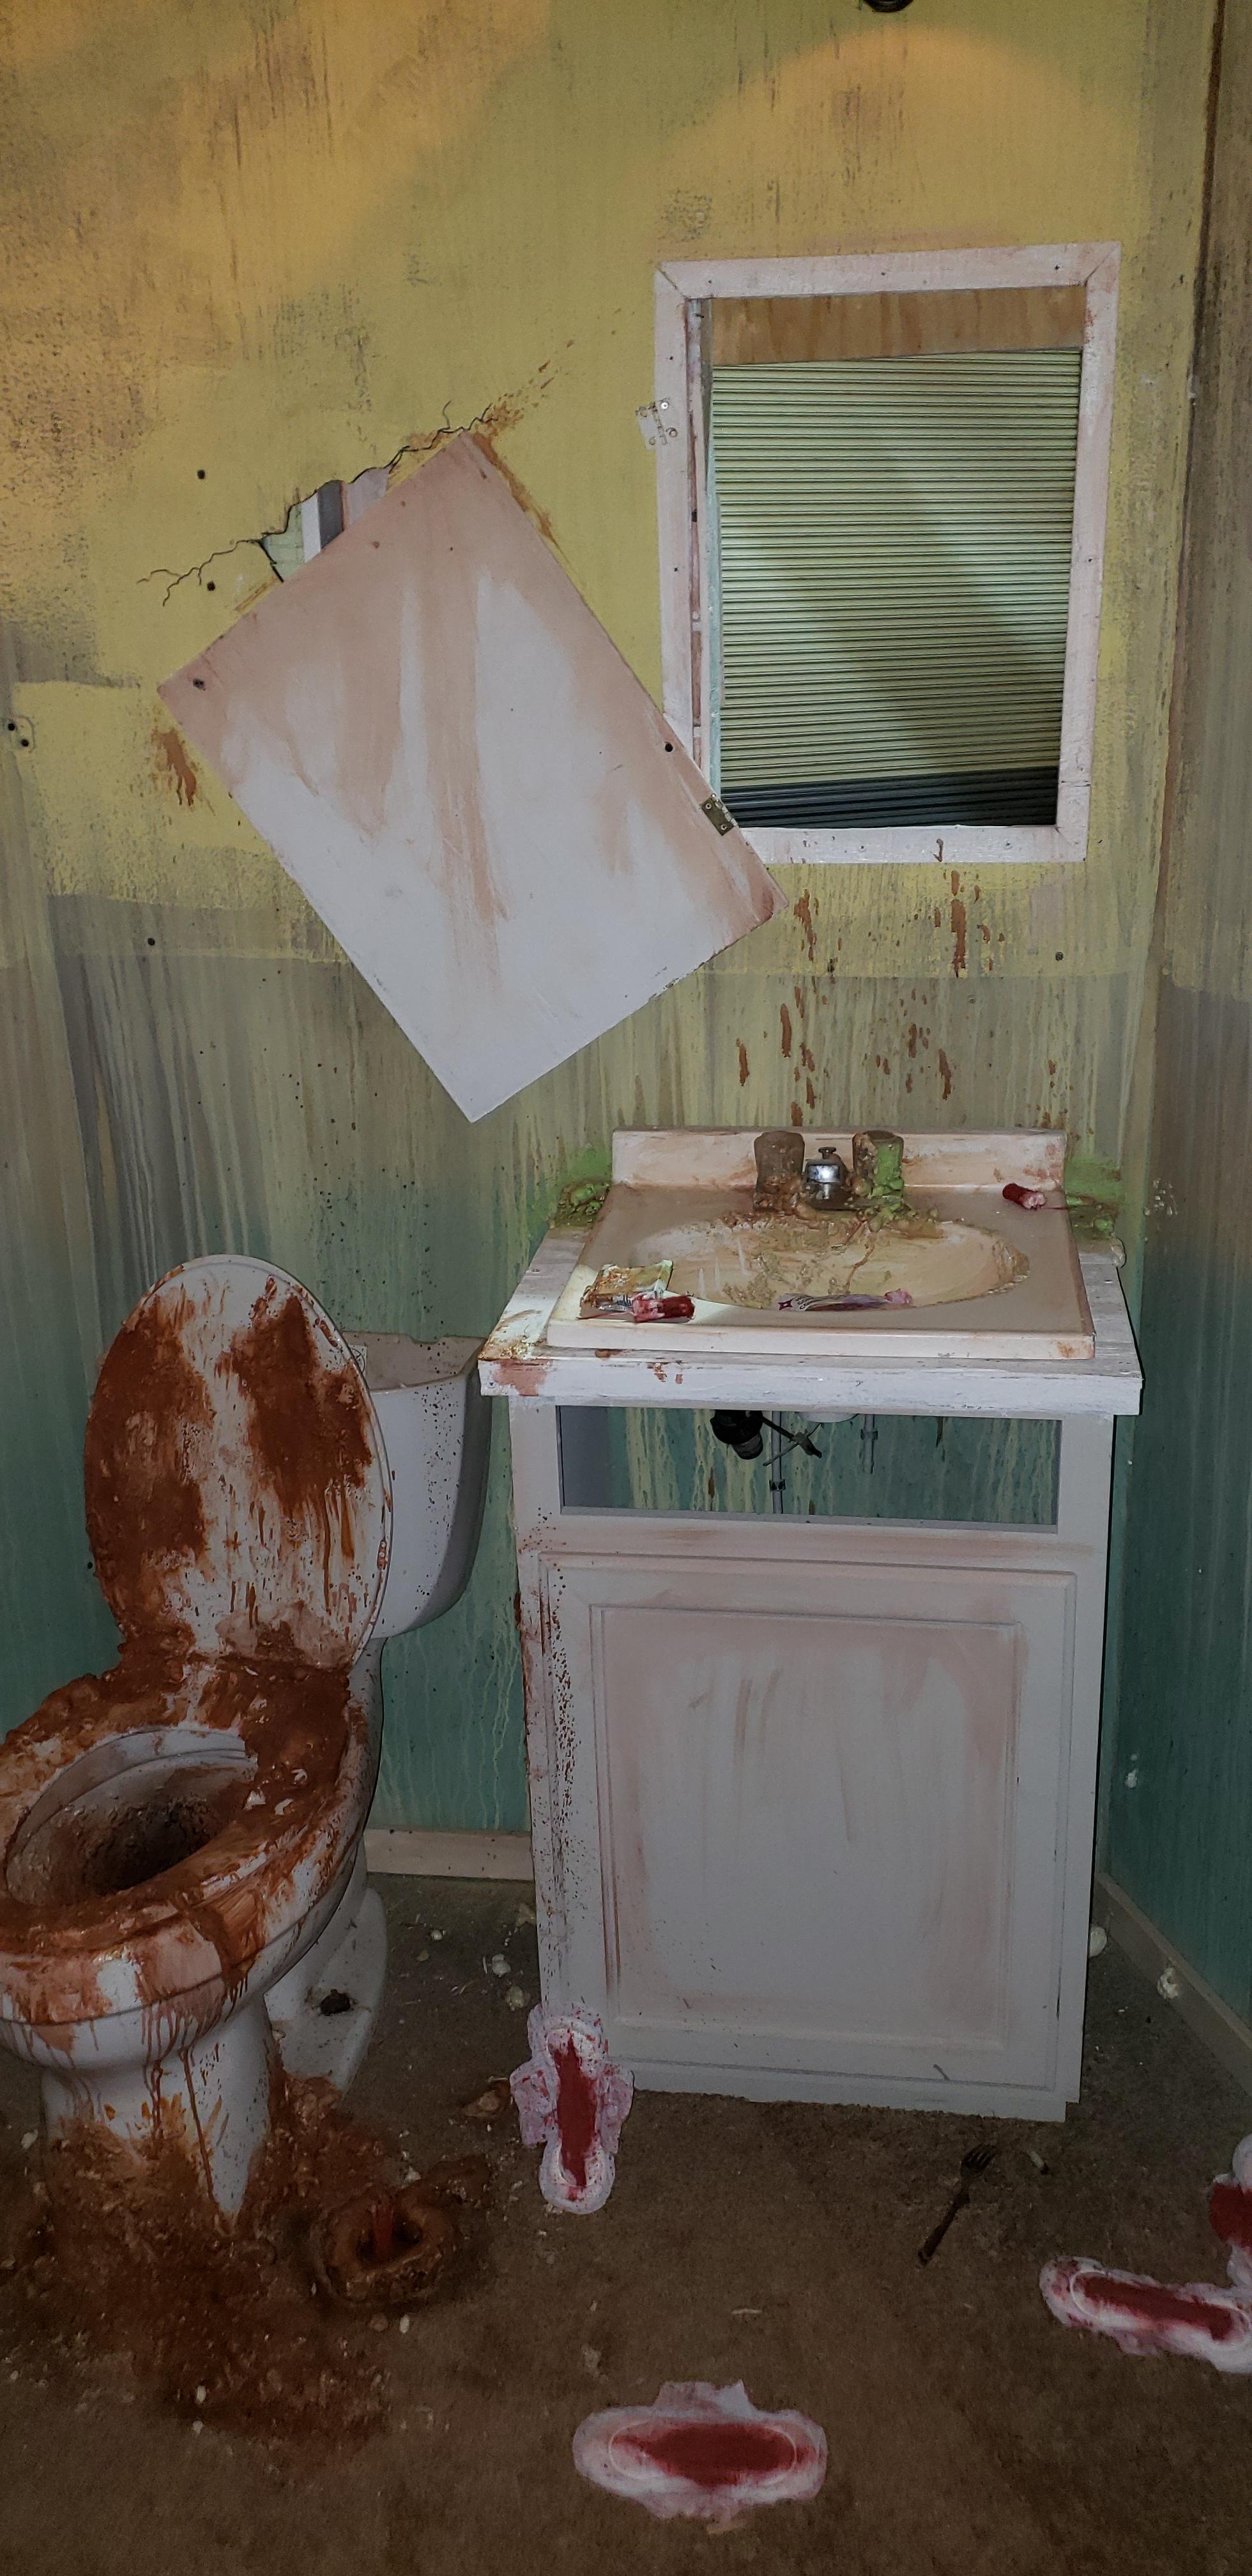 6 9 toilet